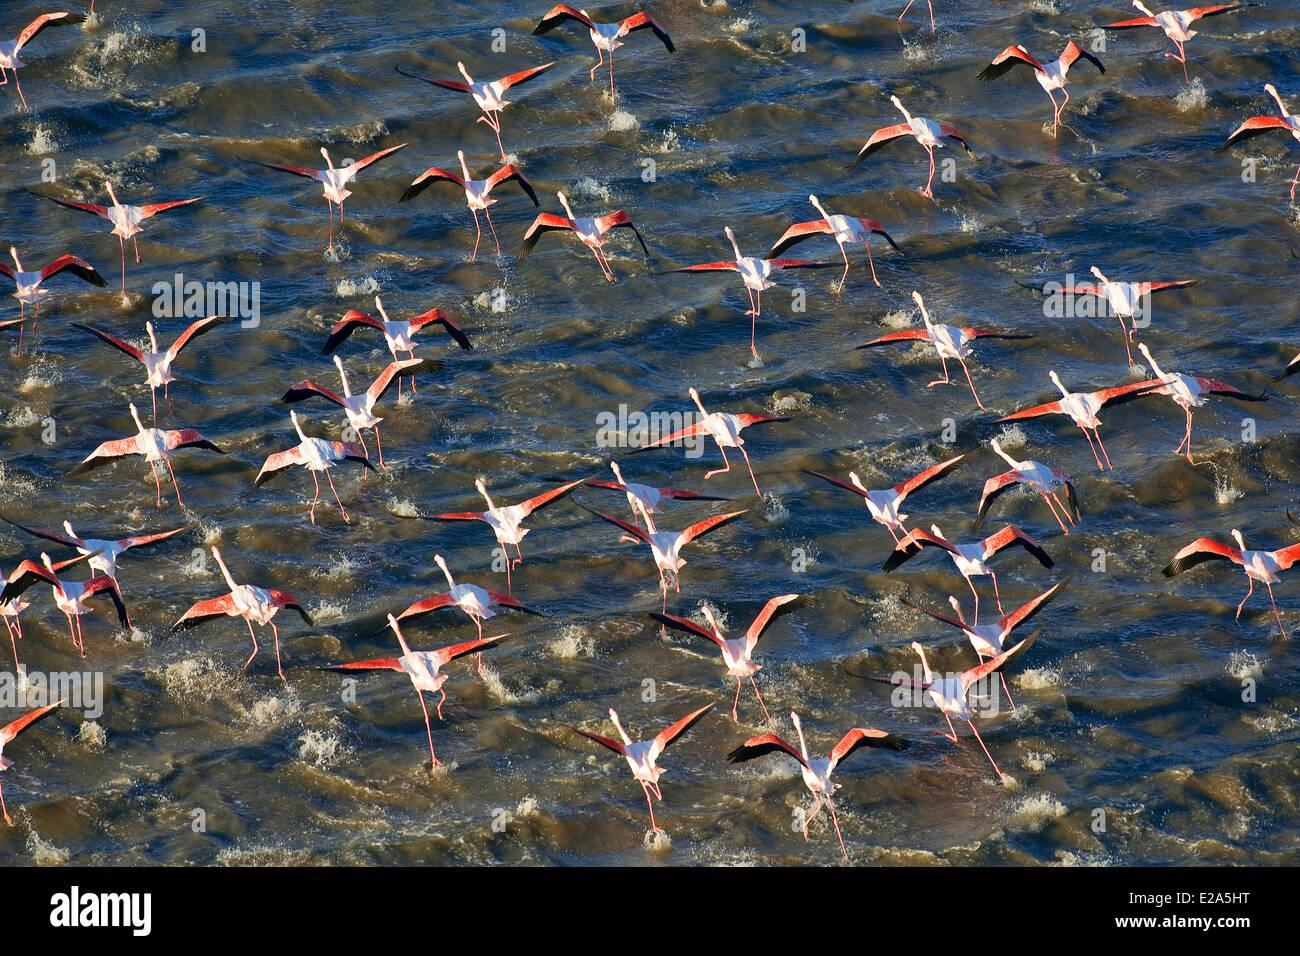 France, Bouches du Rhone, Parc Naturel Regional de Camargue (Natural Regional Park of Camargue), flamingoes (aerial - Stock Image